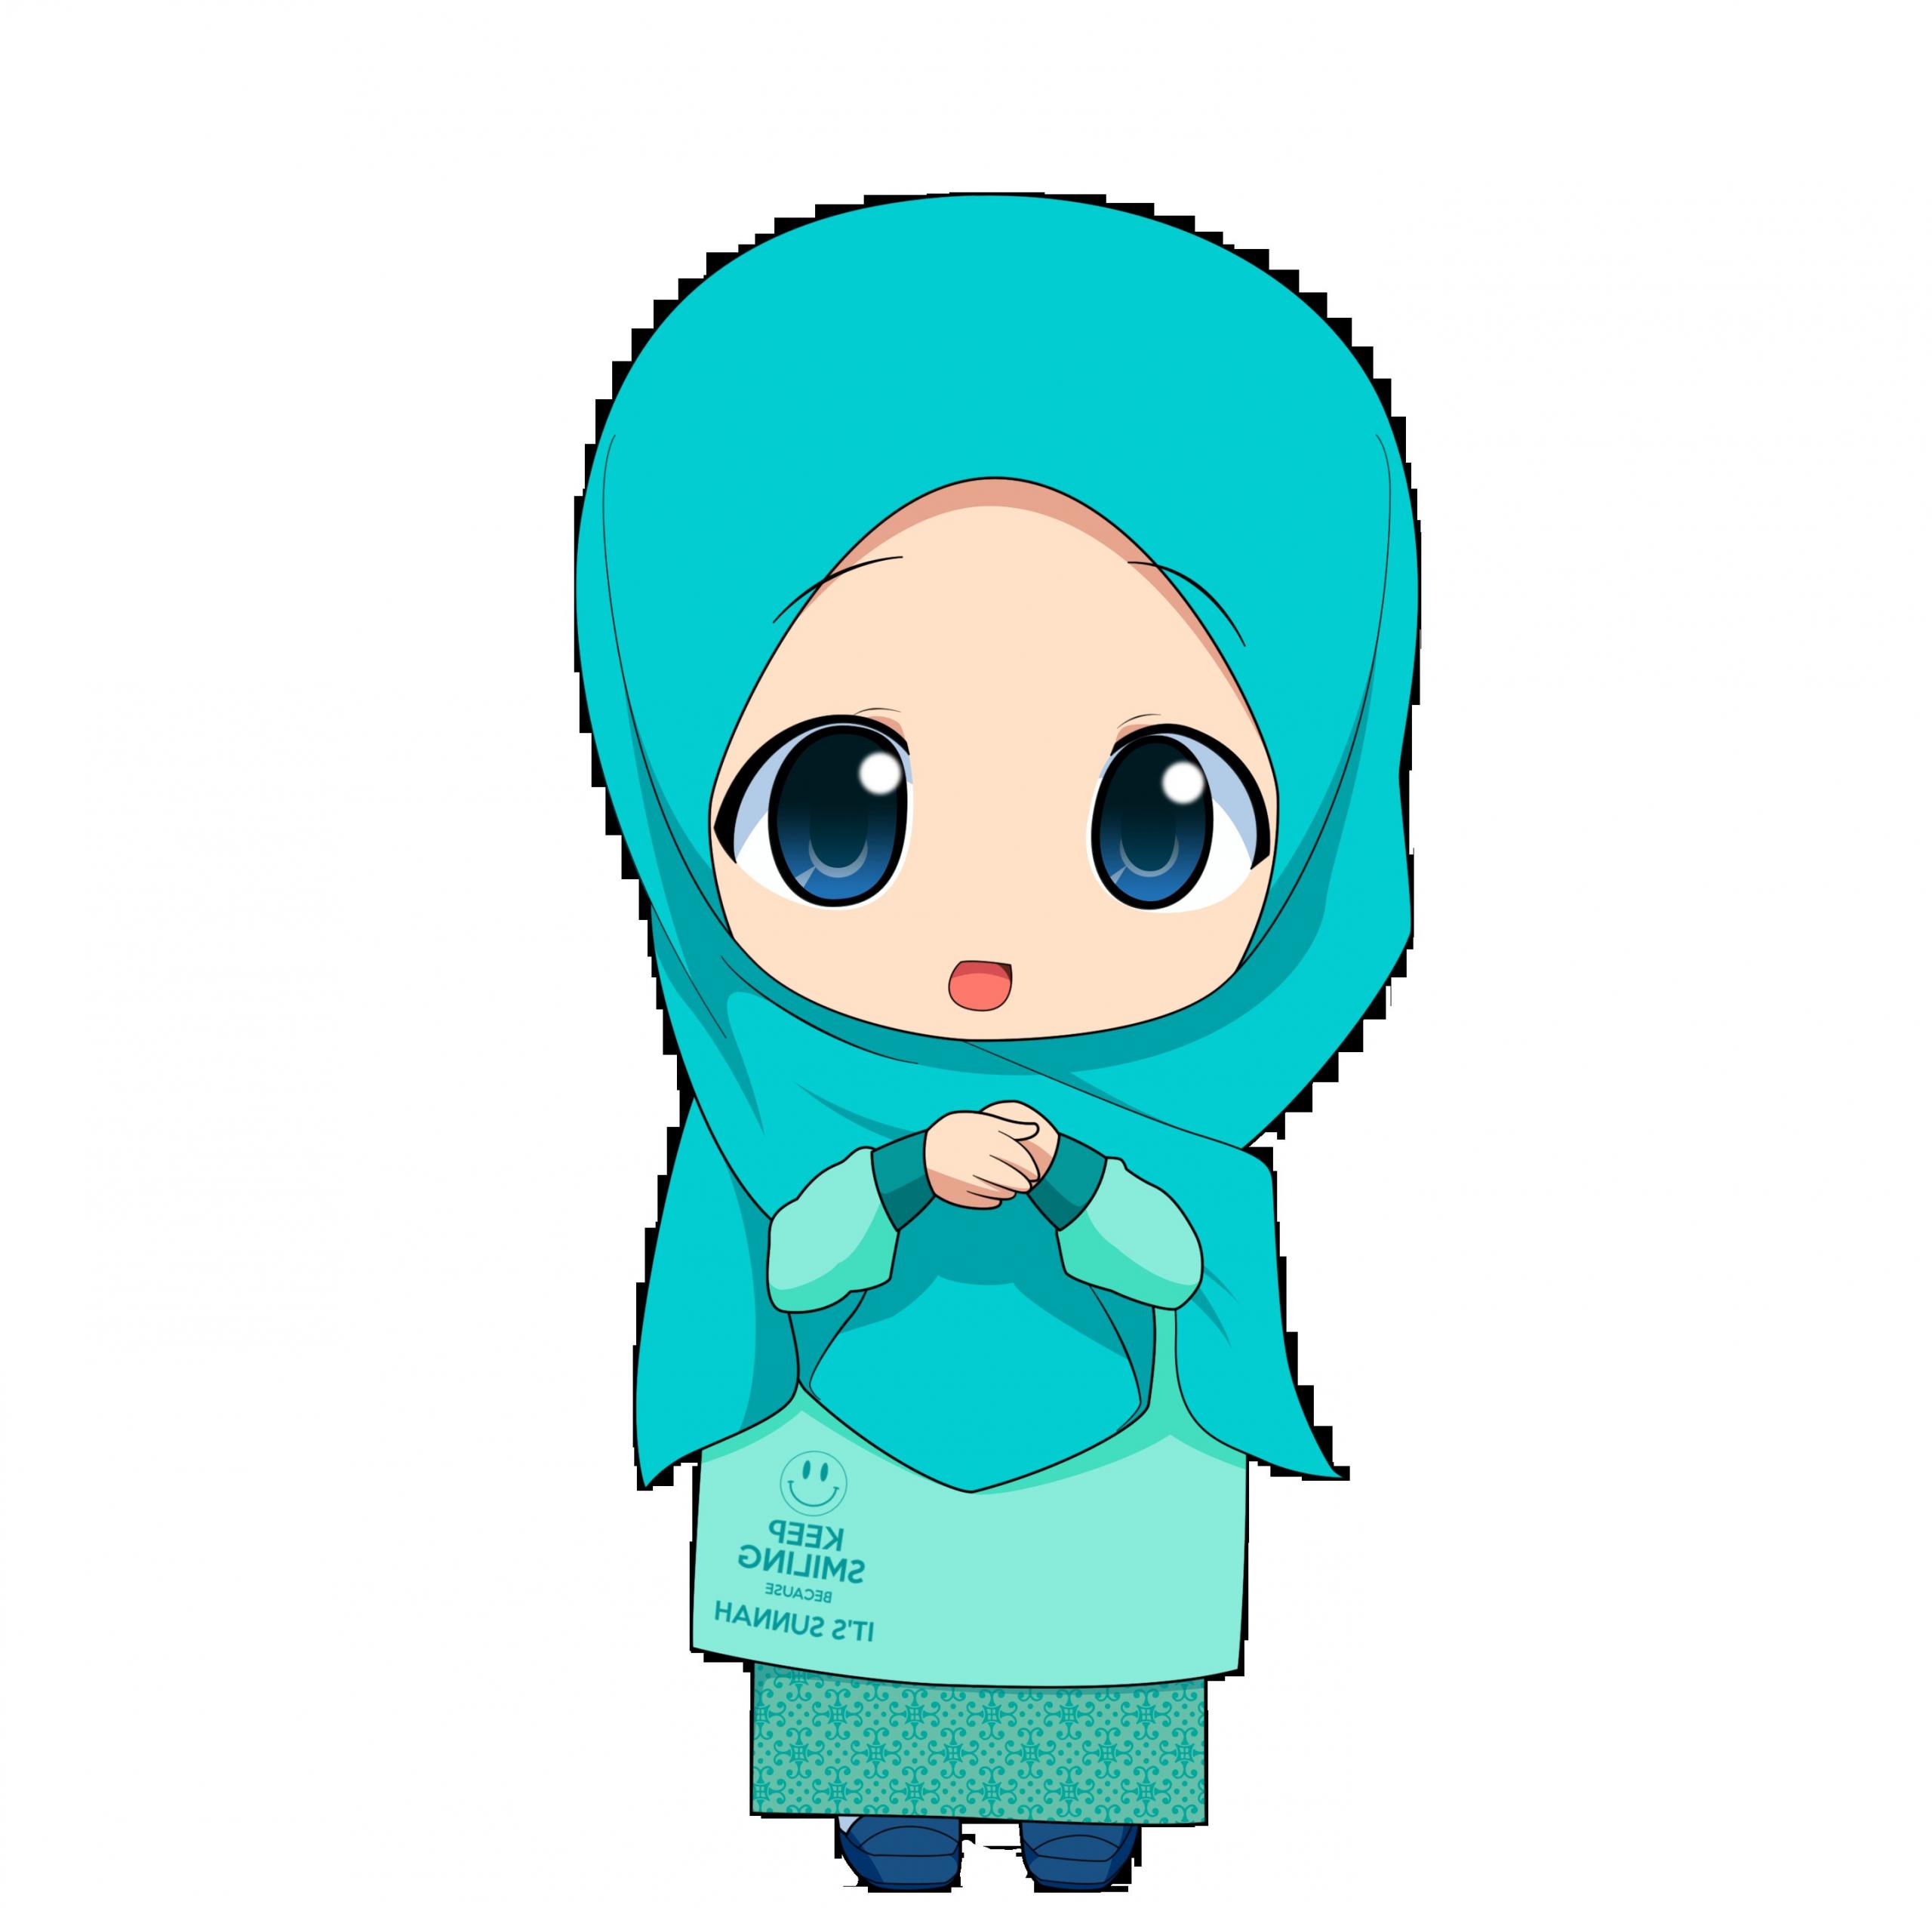 Design Muslimah Kartun O2d5 Gambar Kartun Muslimah Koleksi Gambar Hd